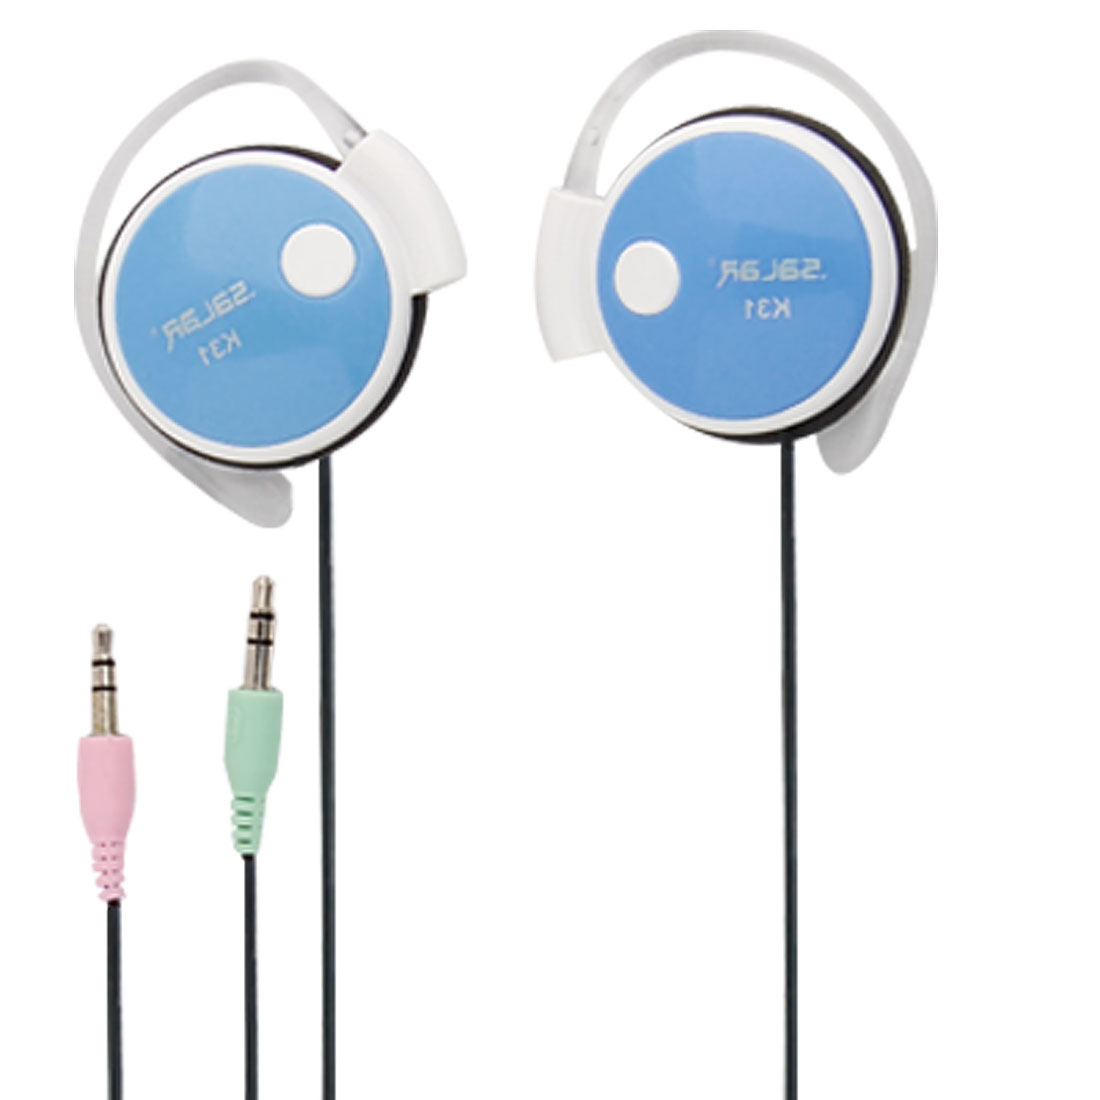 3.5mm Audio Plug Hook Baby Blue Headset Microphone